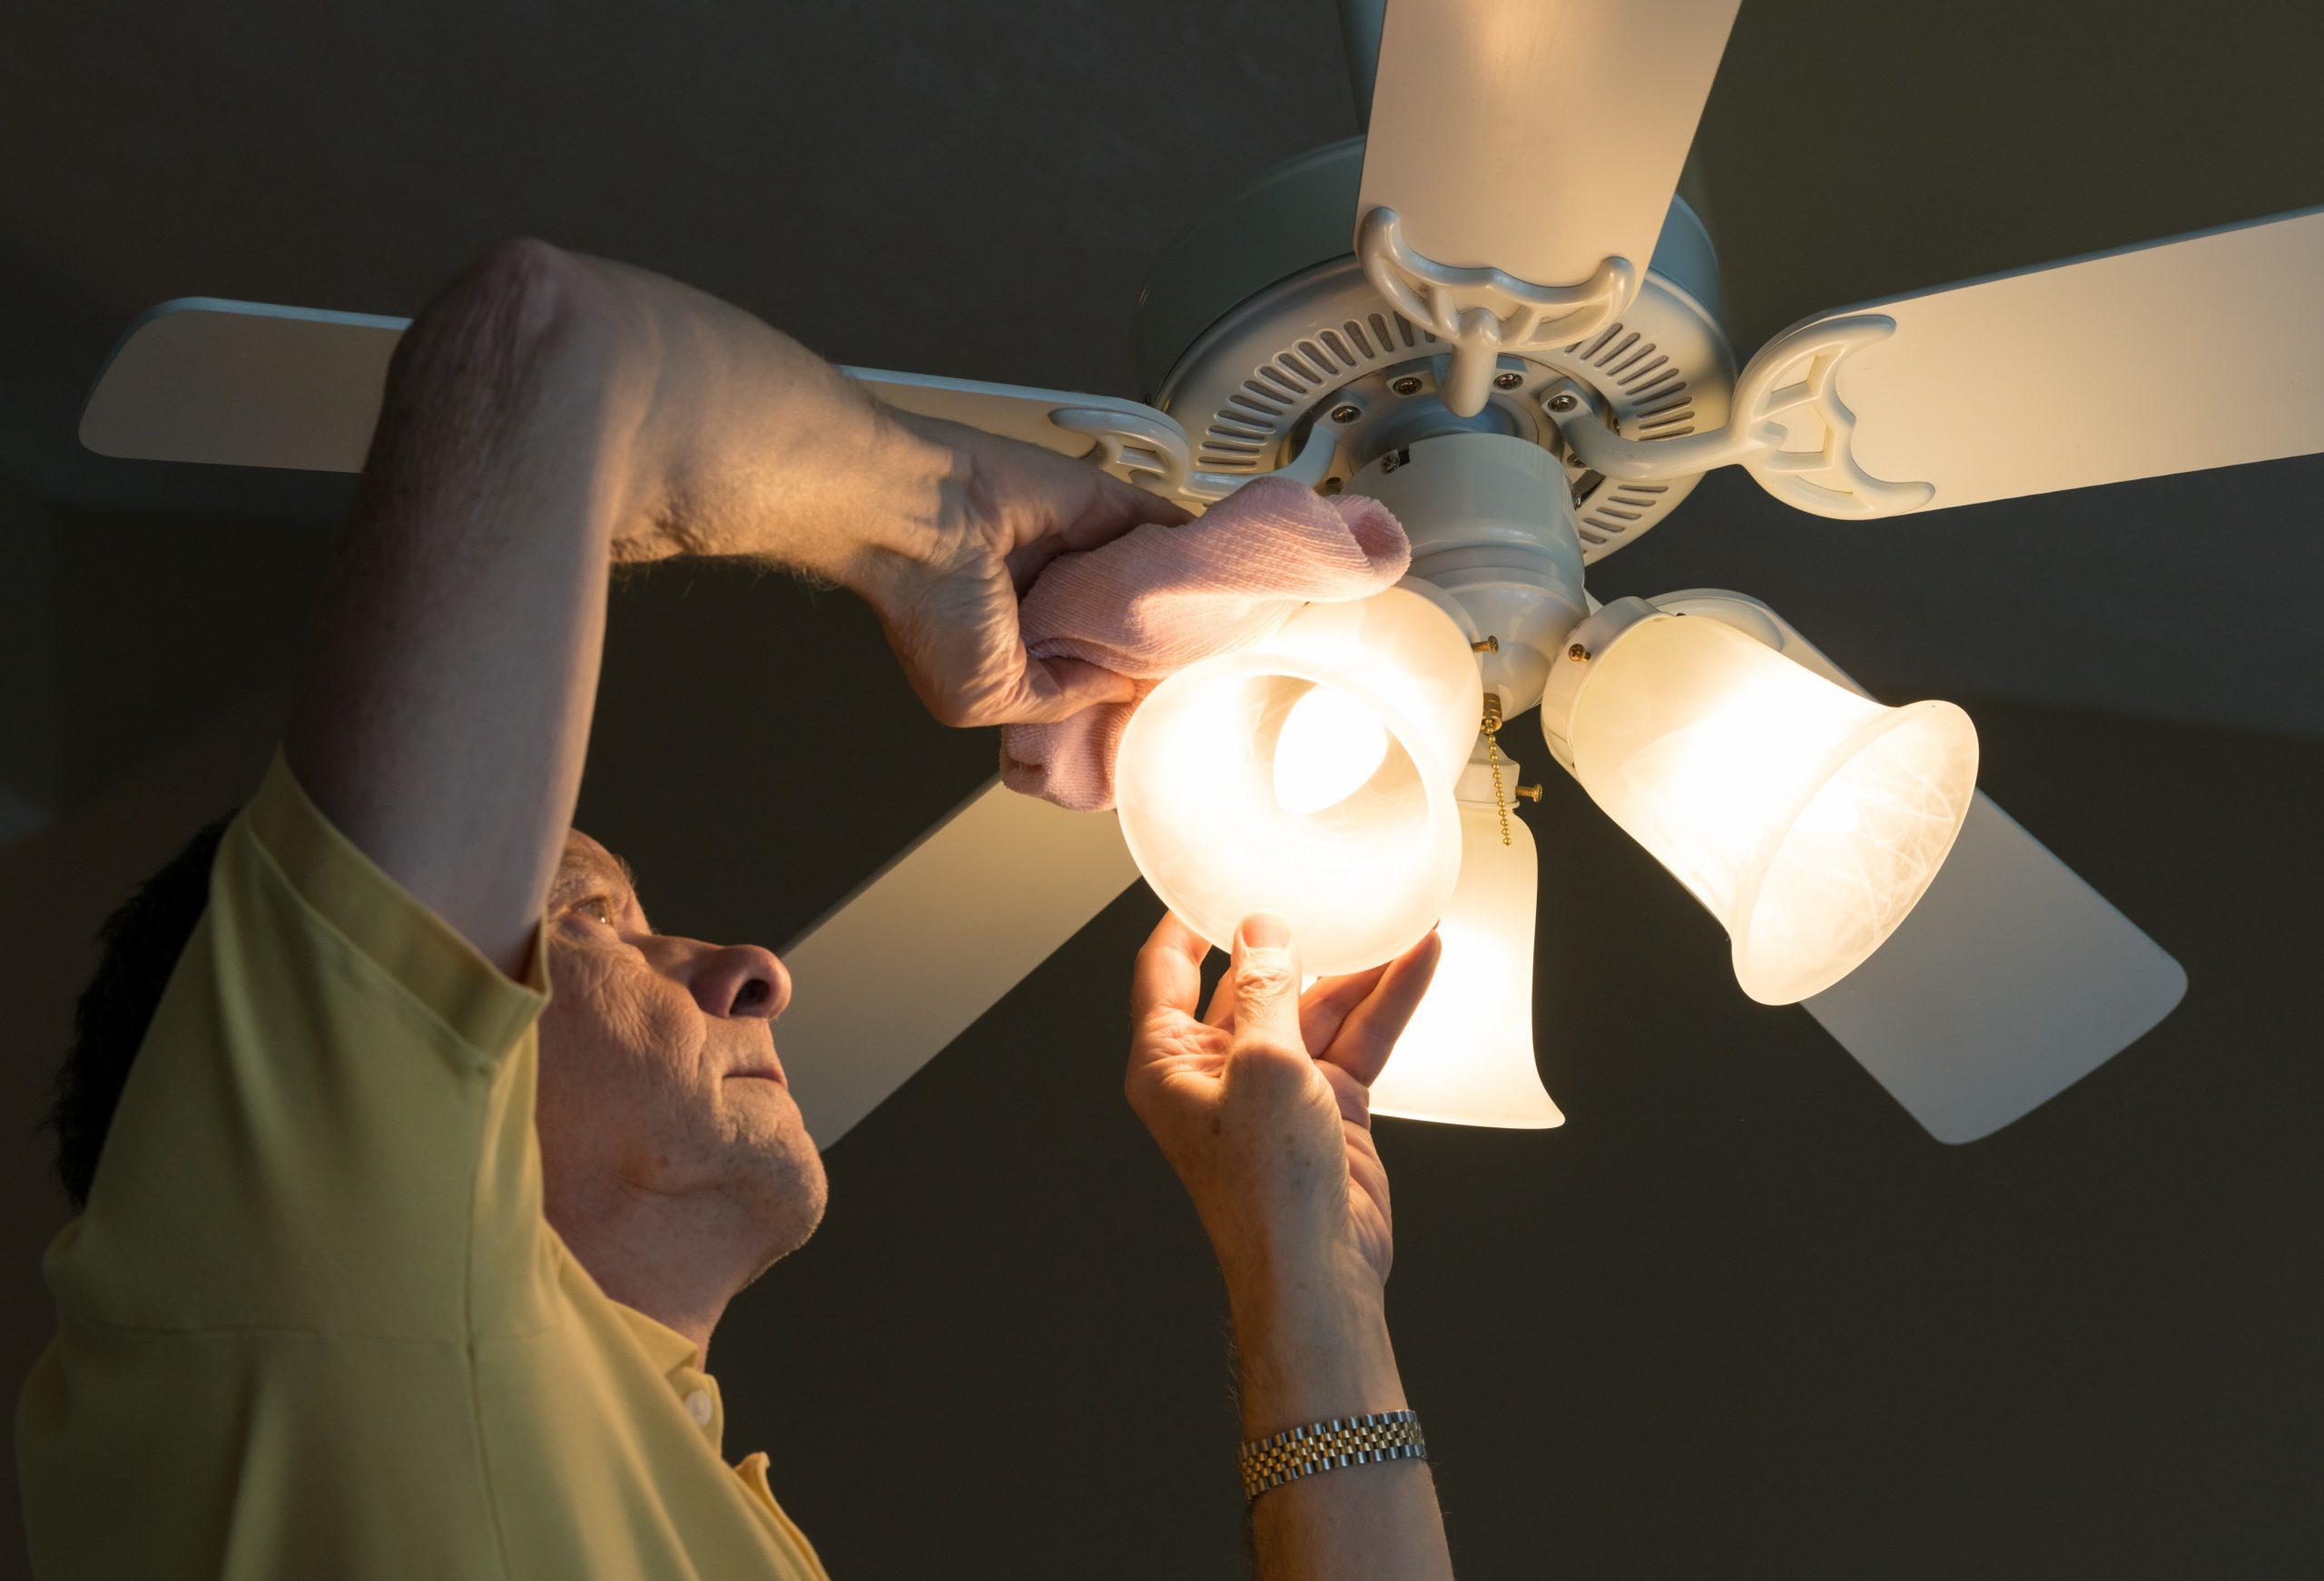 ceiling fan cleaning service edwardsville il